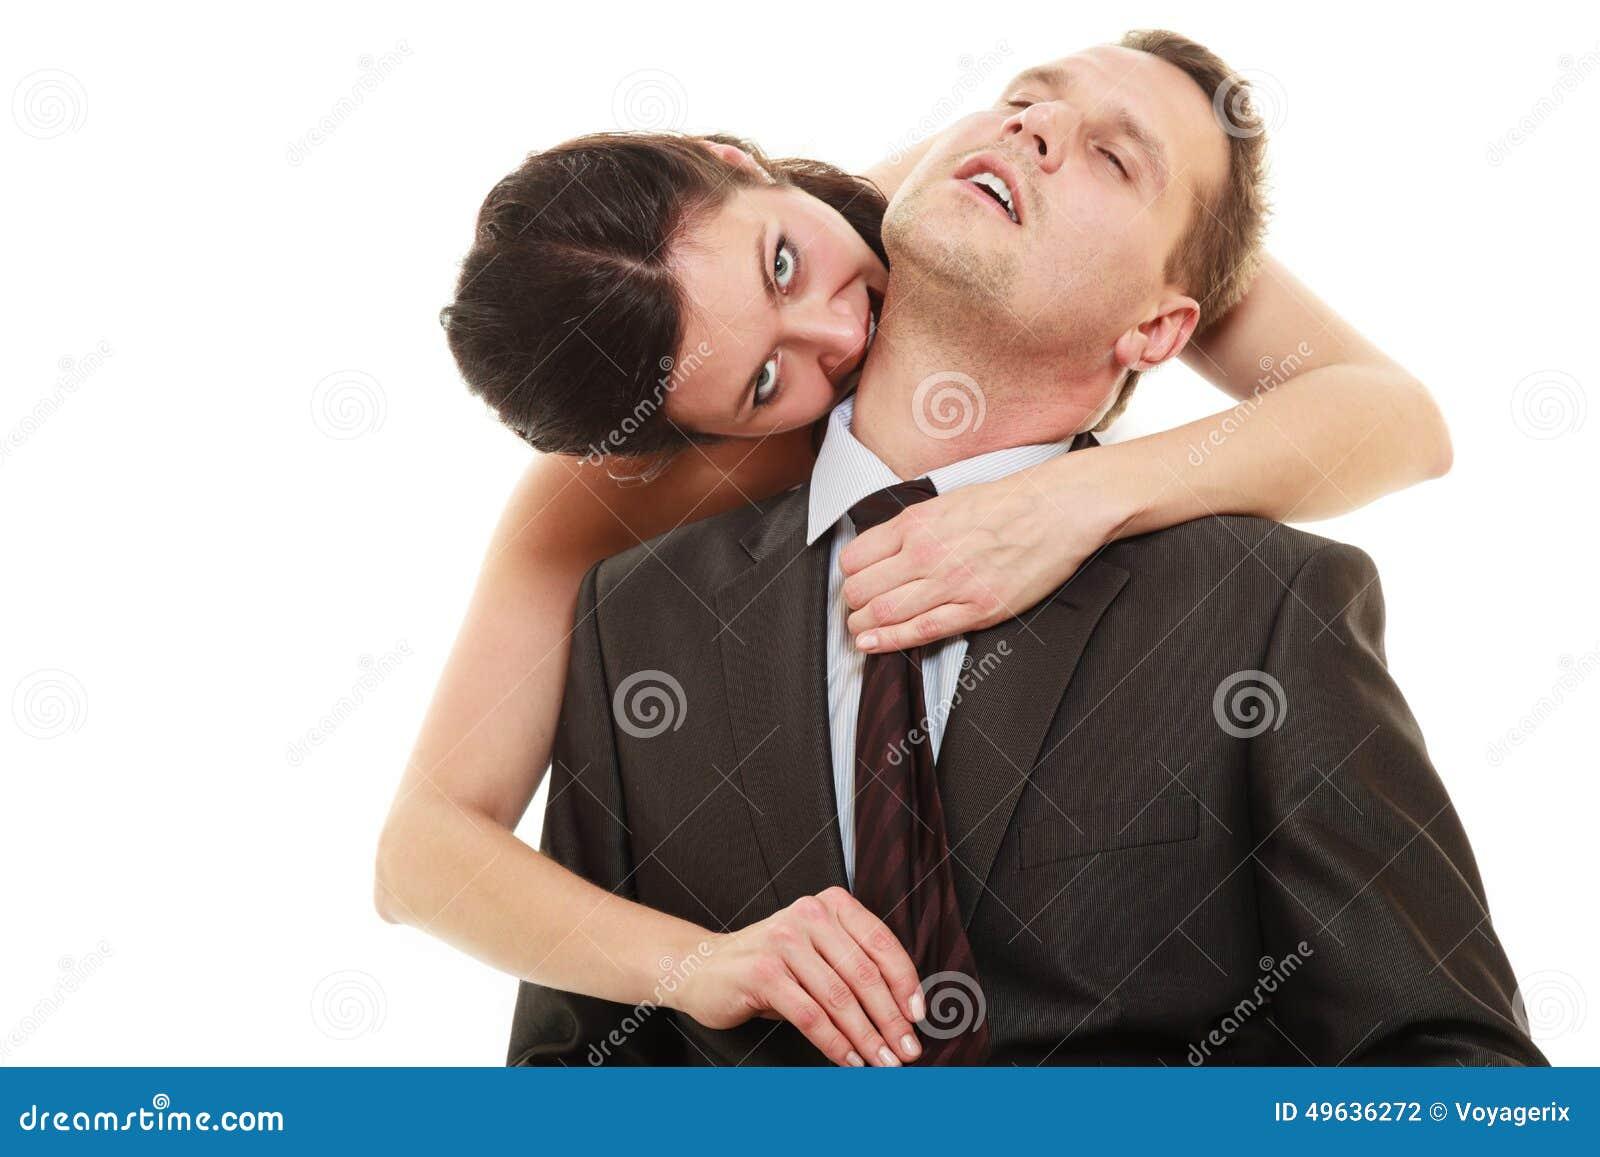 Dominant Bride With Husband Stock Photo - Image: 49636272